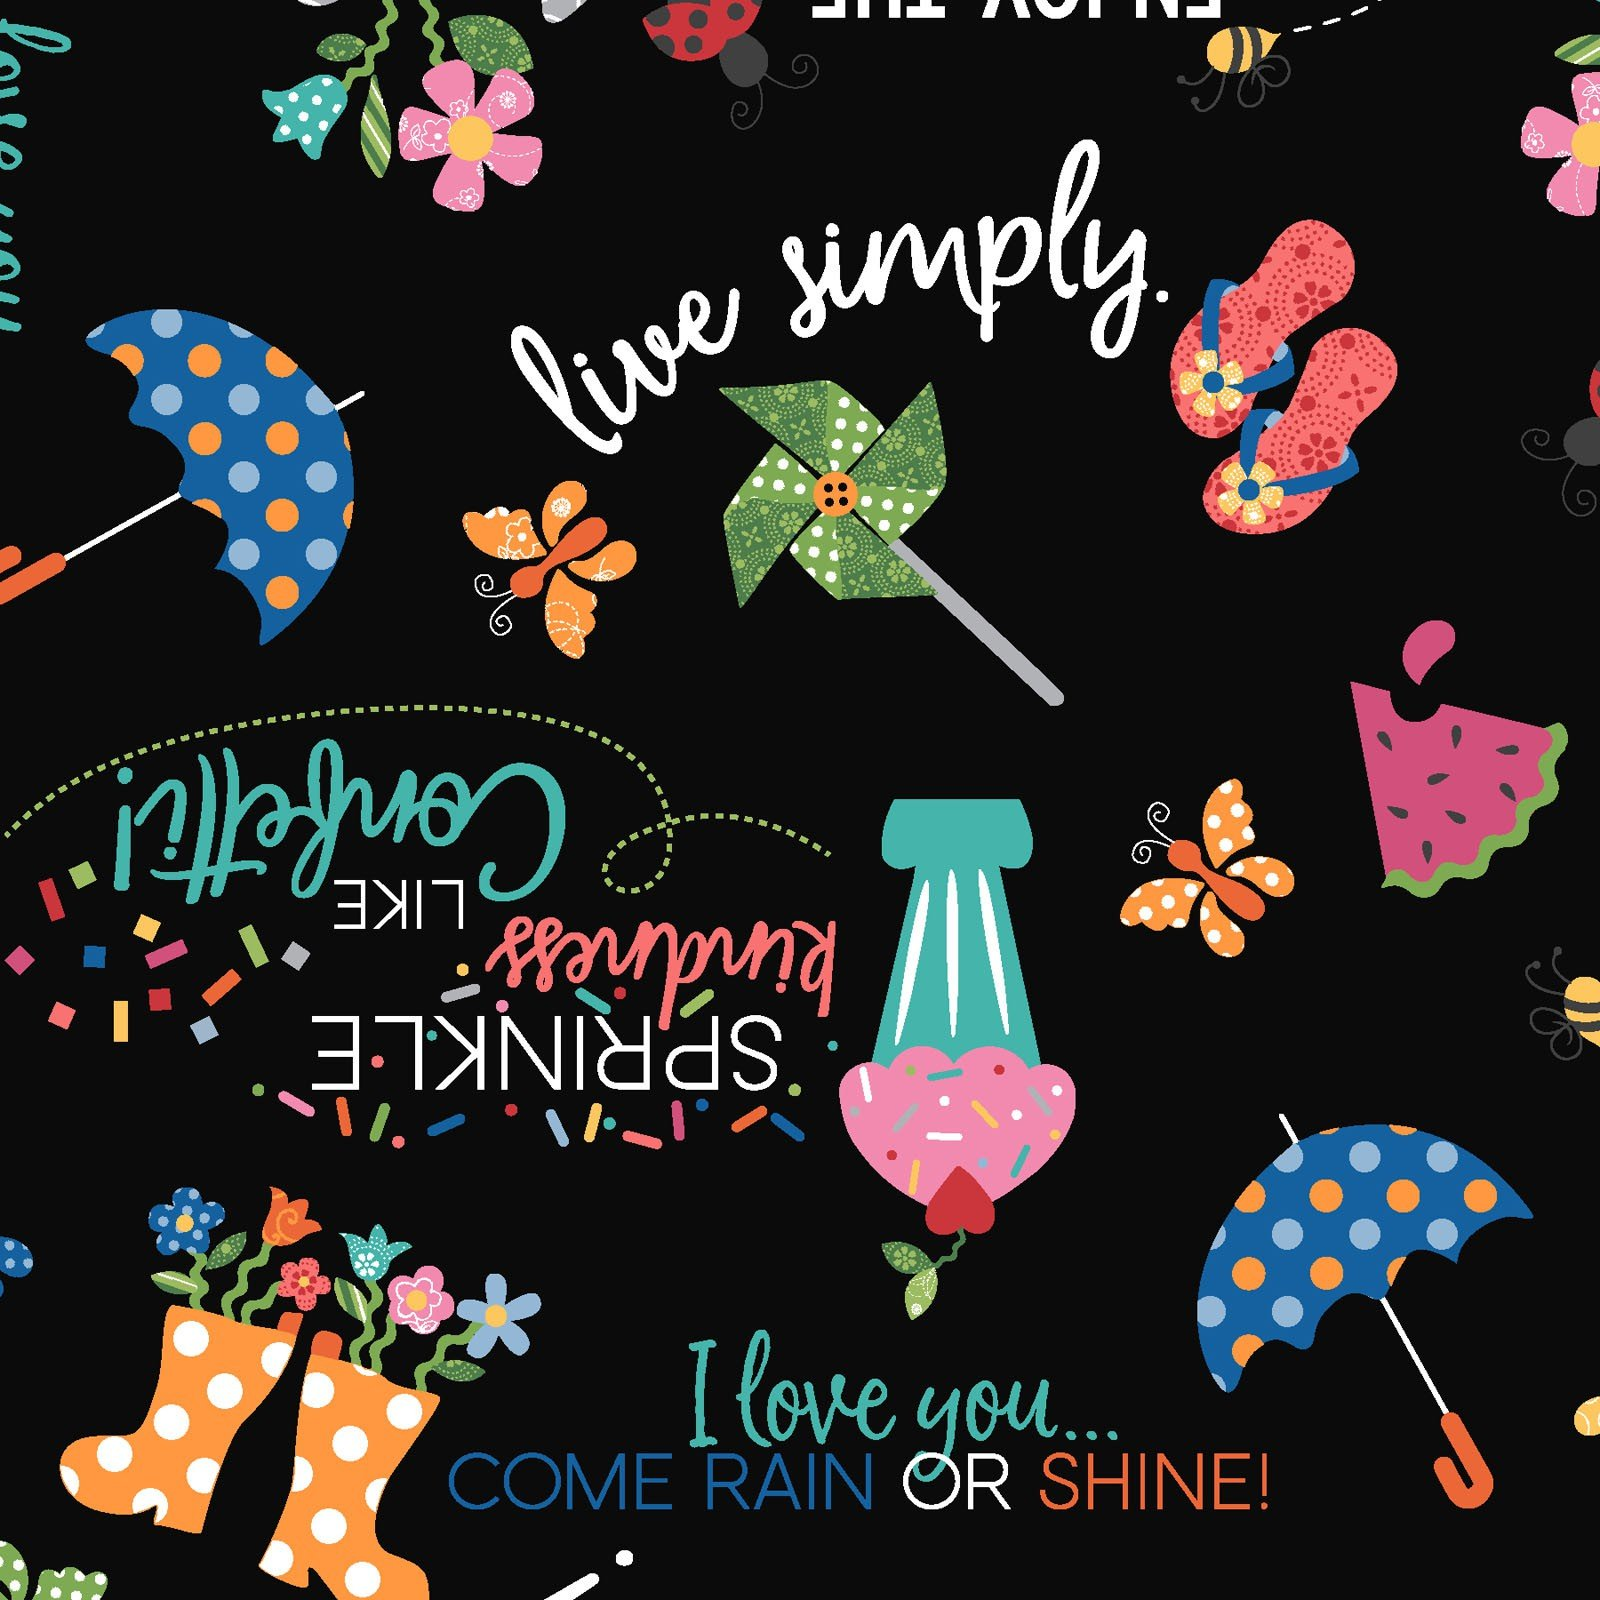 Sprinkle Sunshine-Sayings on black